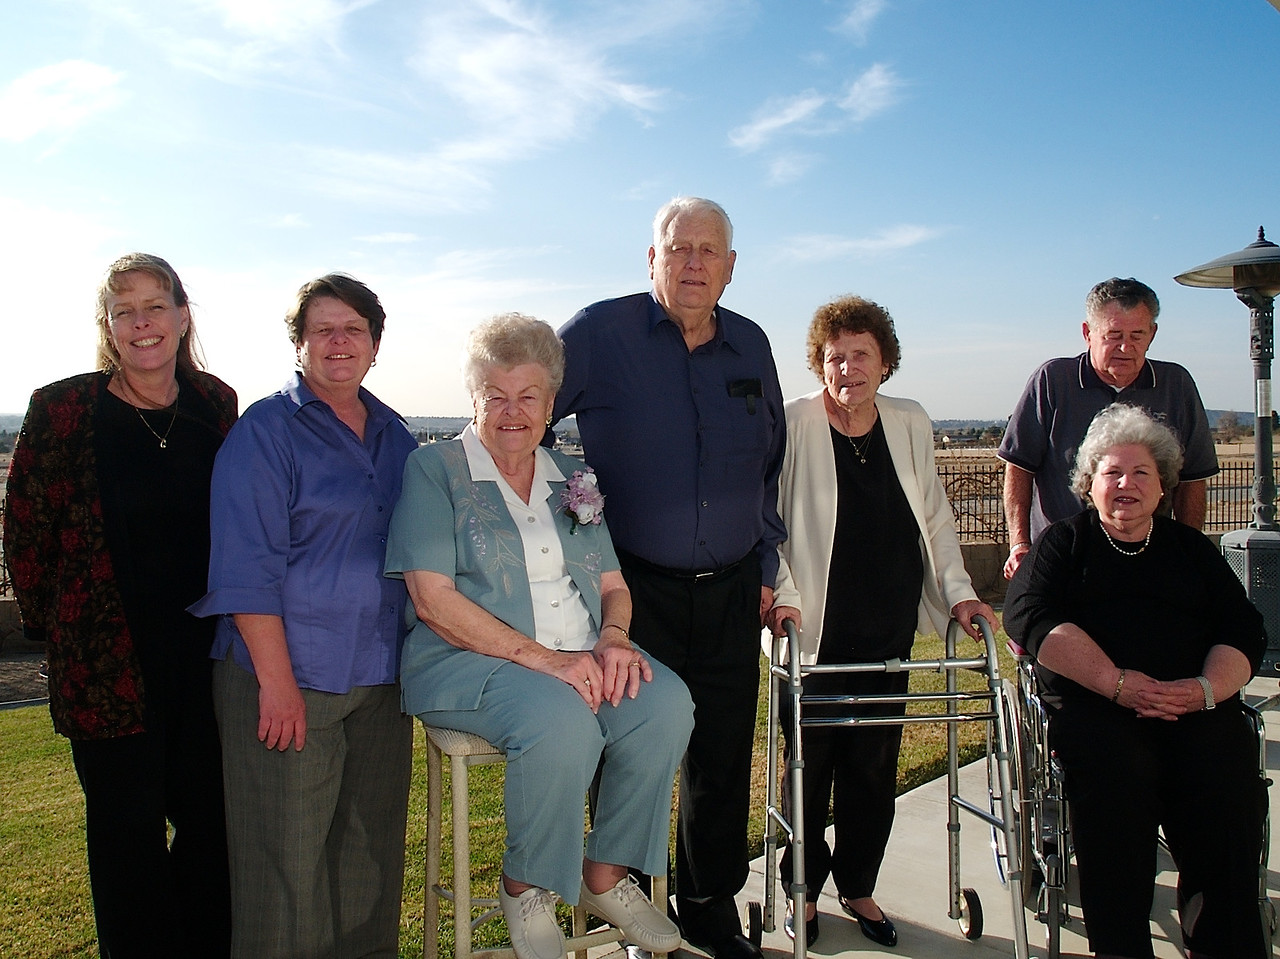 Barb, Cheryl, Ellen, Howard, Marge, Hollis and Helen.